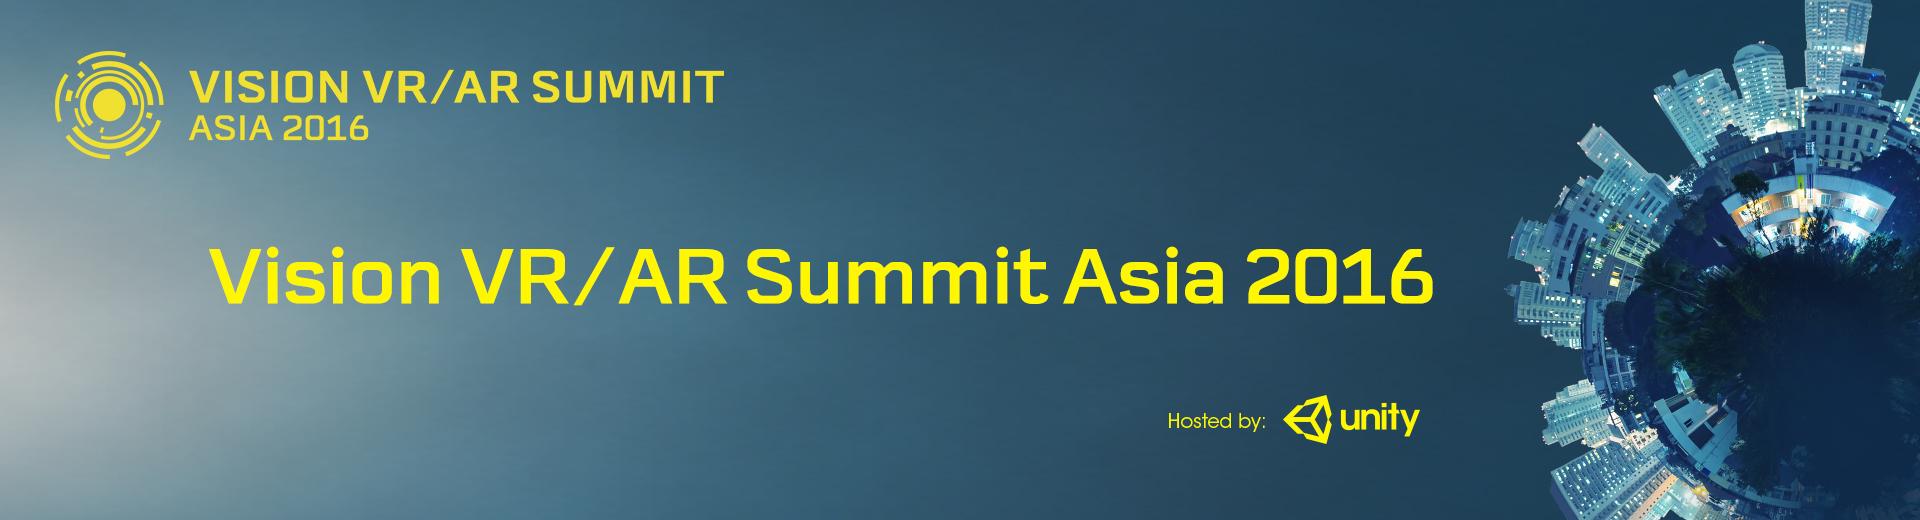 Vision VR/AR Summit Asia 2016